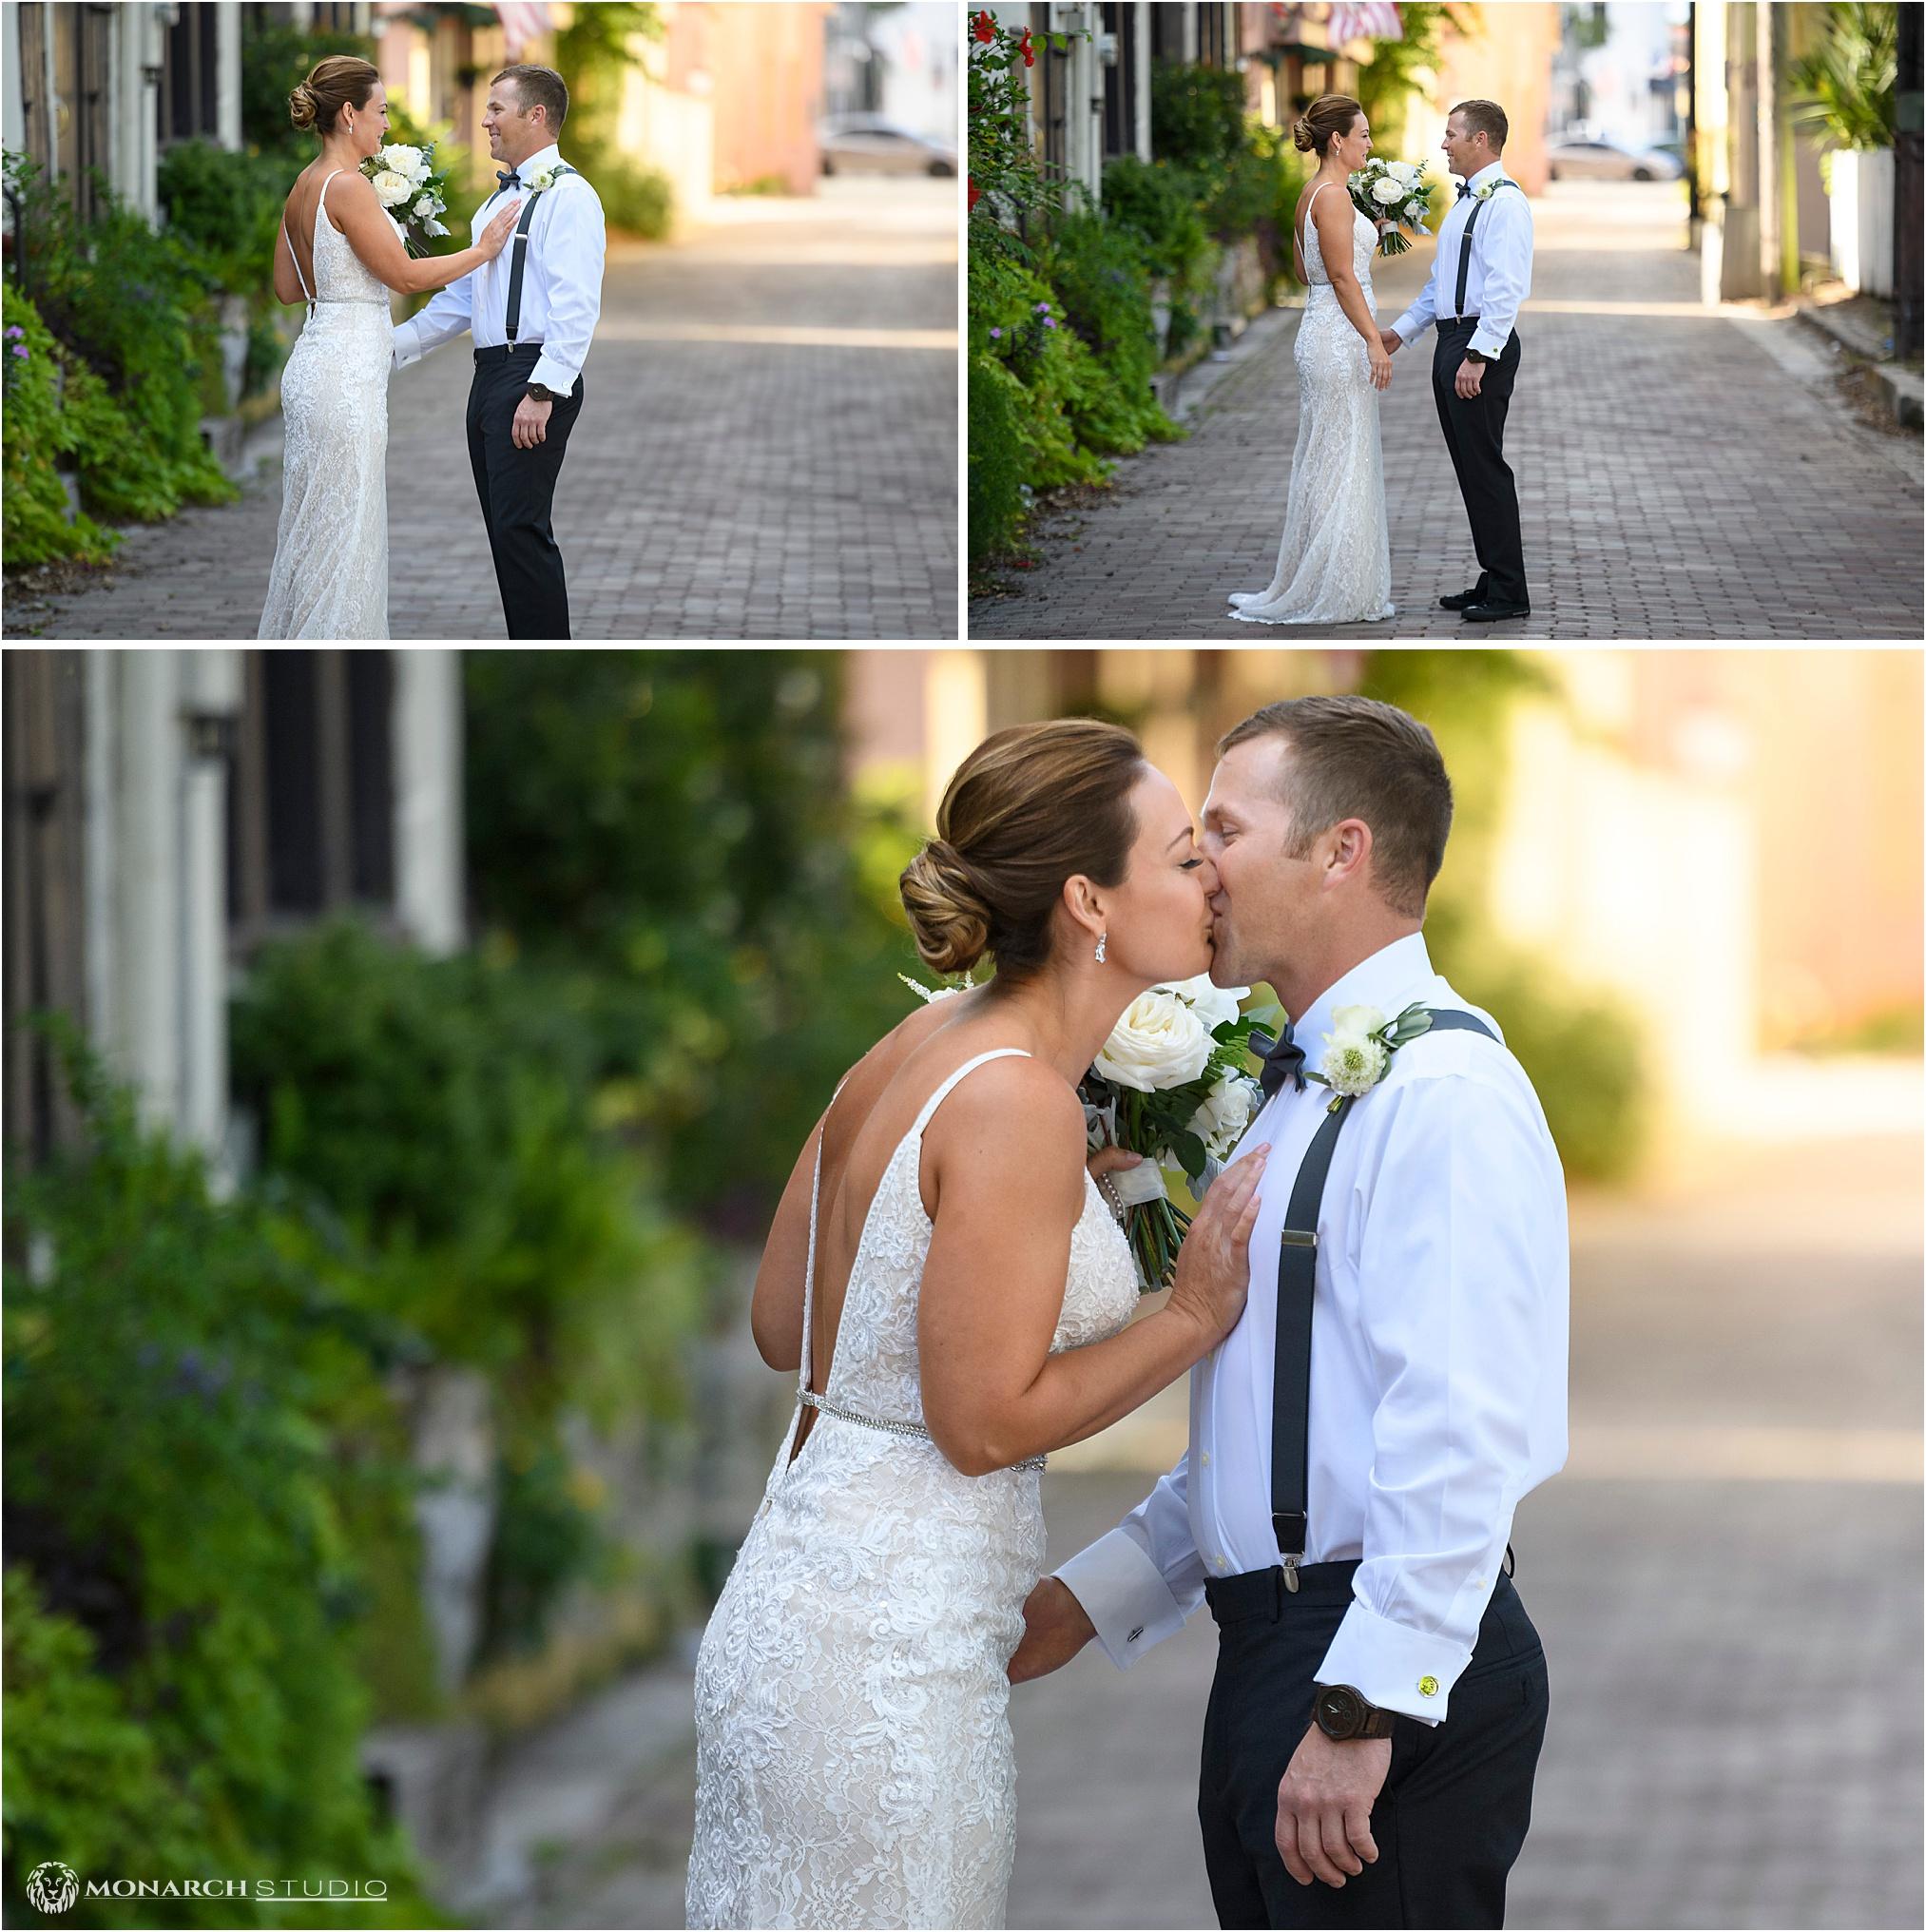 040-whiteroom-wedding-photographer-2019-05-22_0022.jpg